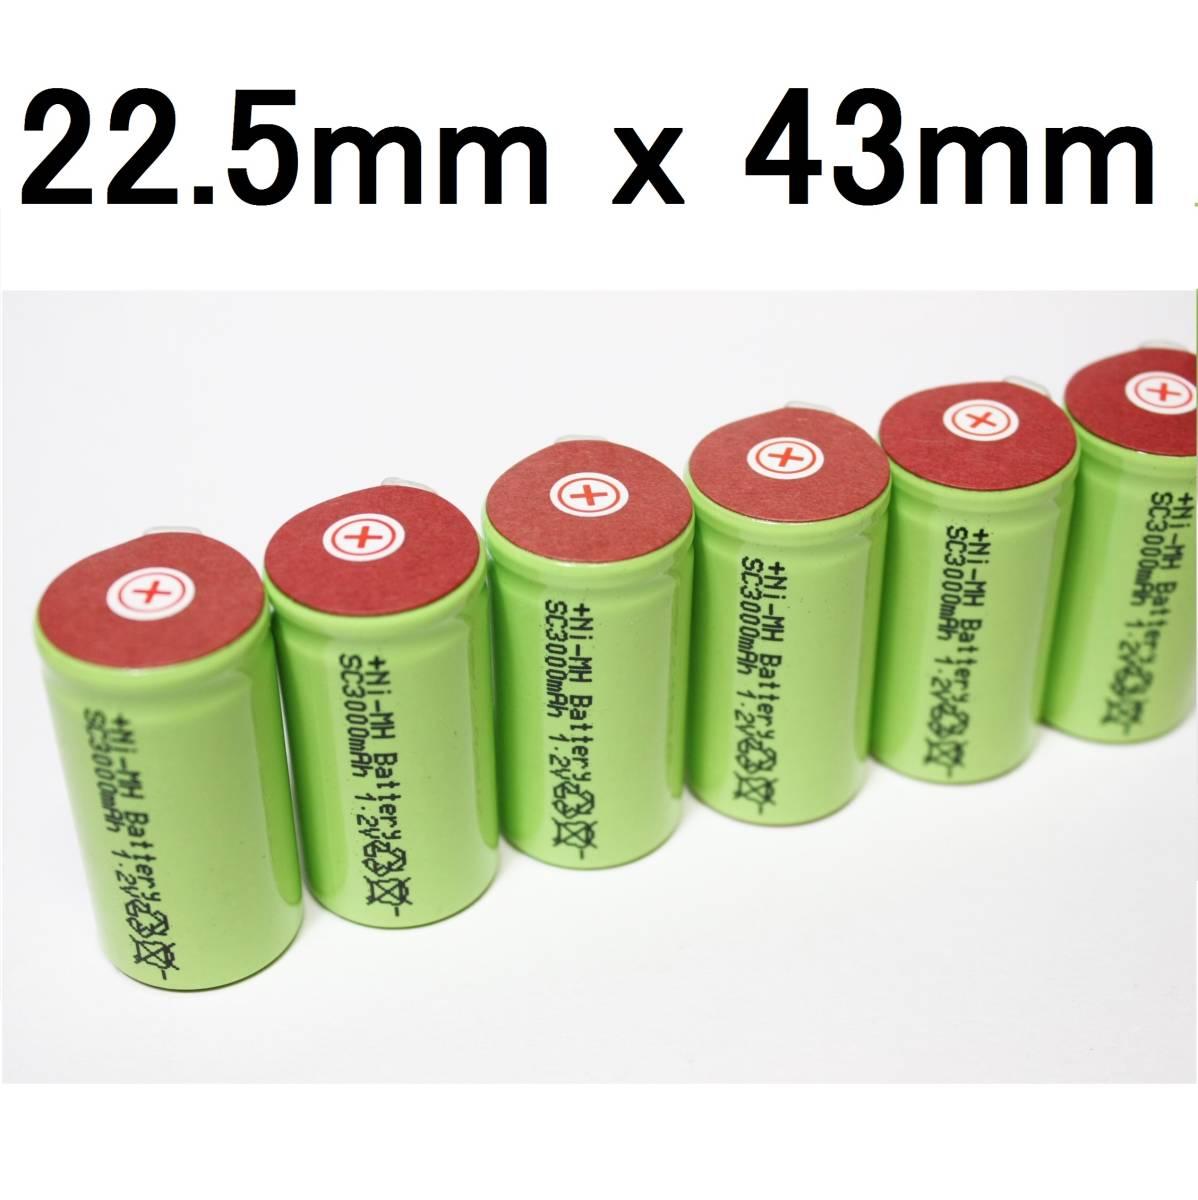 ★22.5x43mm NI-MH Sub-C SC ニッケル水素 ミニ単2 サブC セル エアガン 電動ガン ドライバー ドリル 工具 掃除機 充電池 バッテリー04_画像1